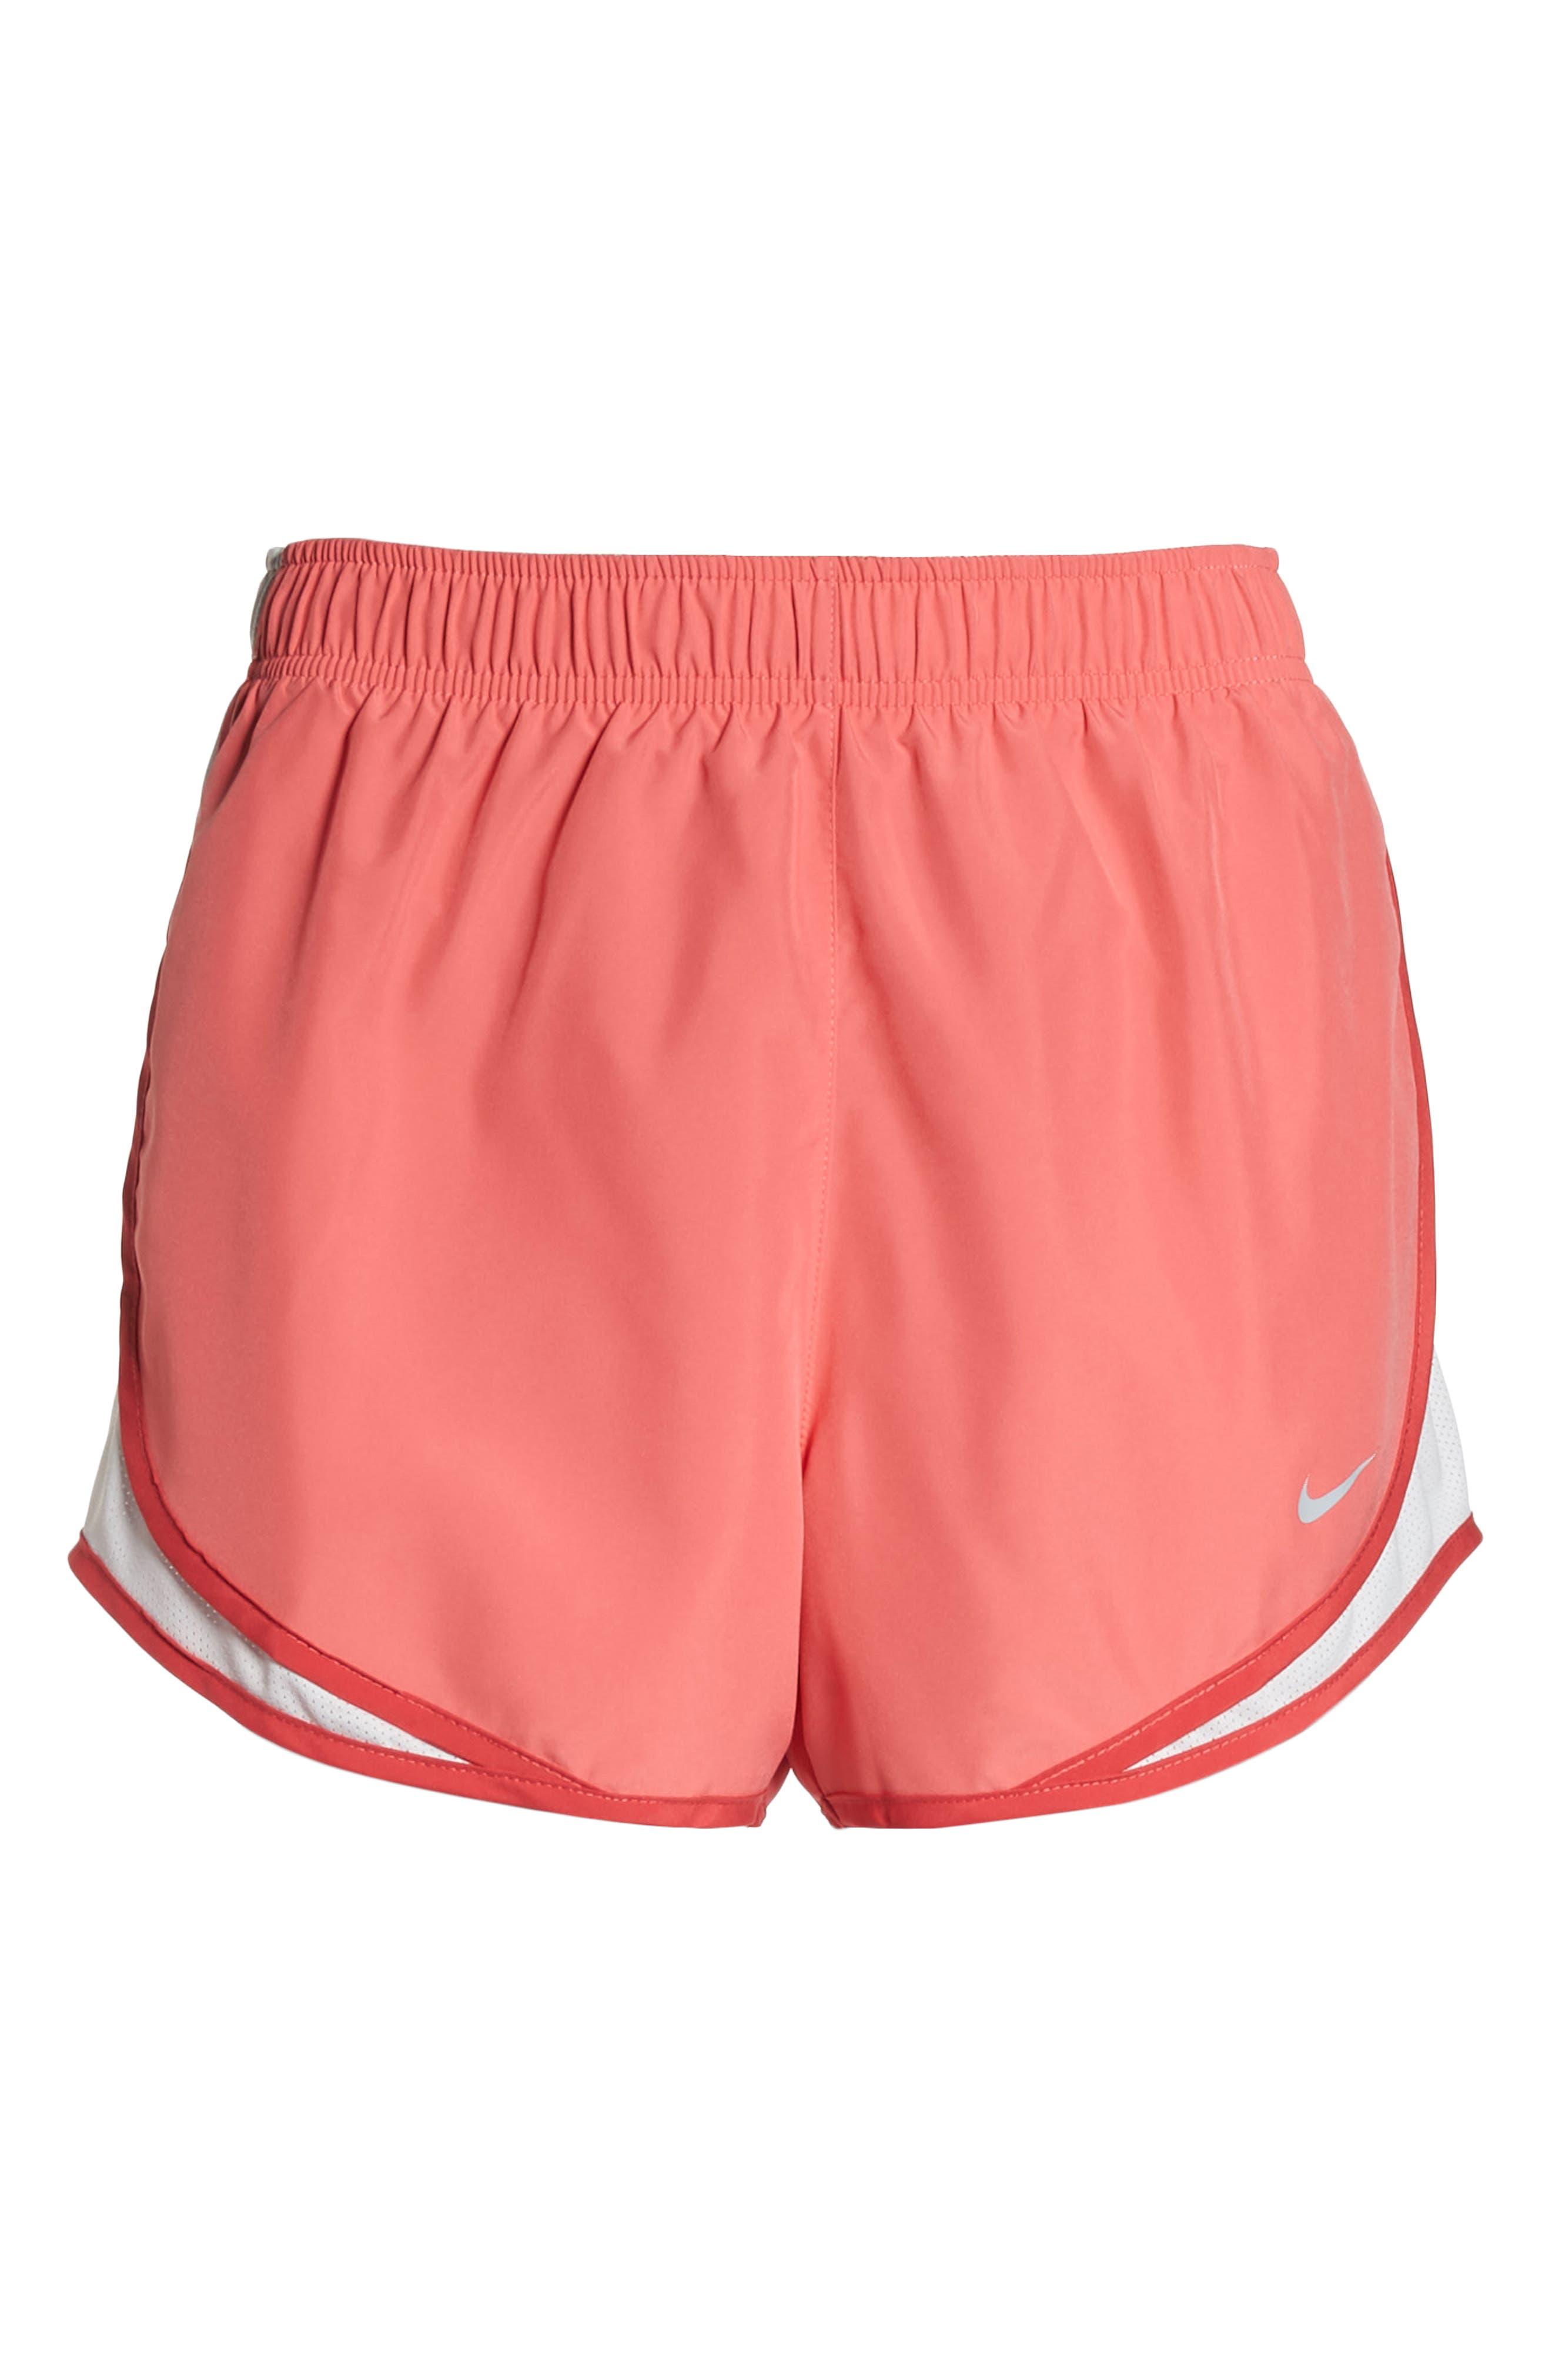 Dry Tempo Running Shorts,                             Alternate thumbnail 437, color,